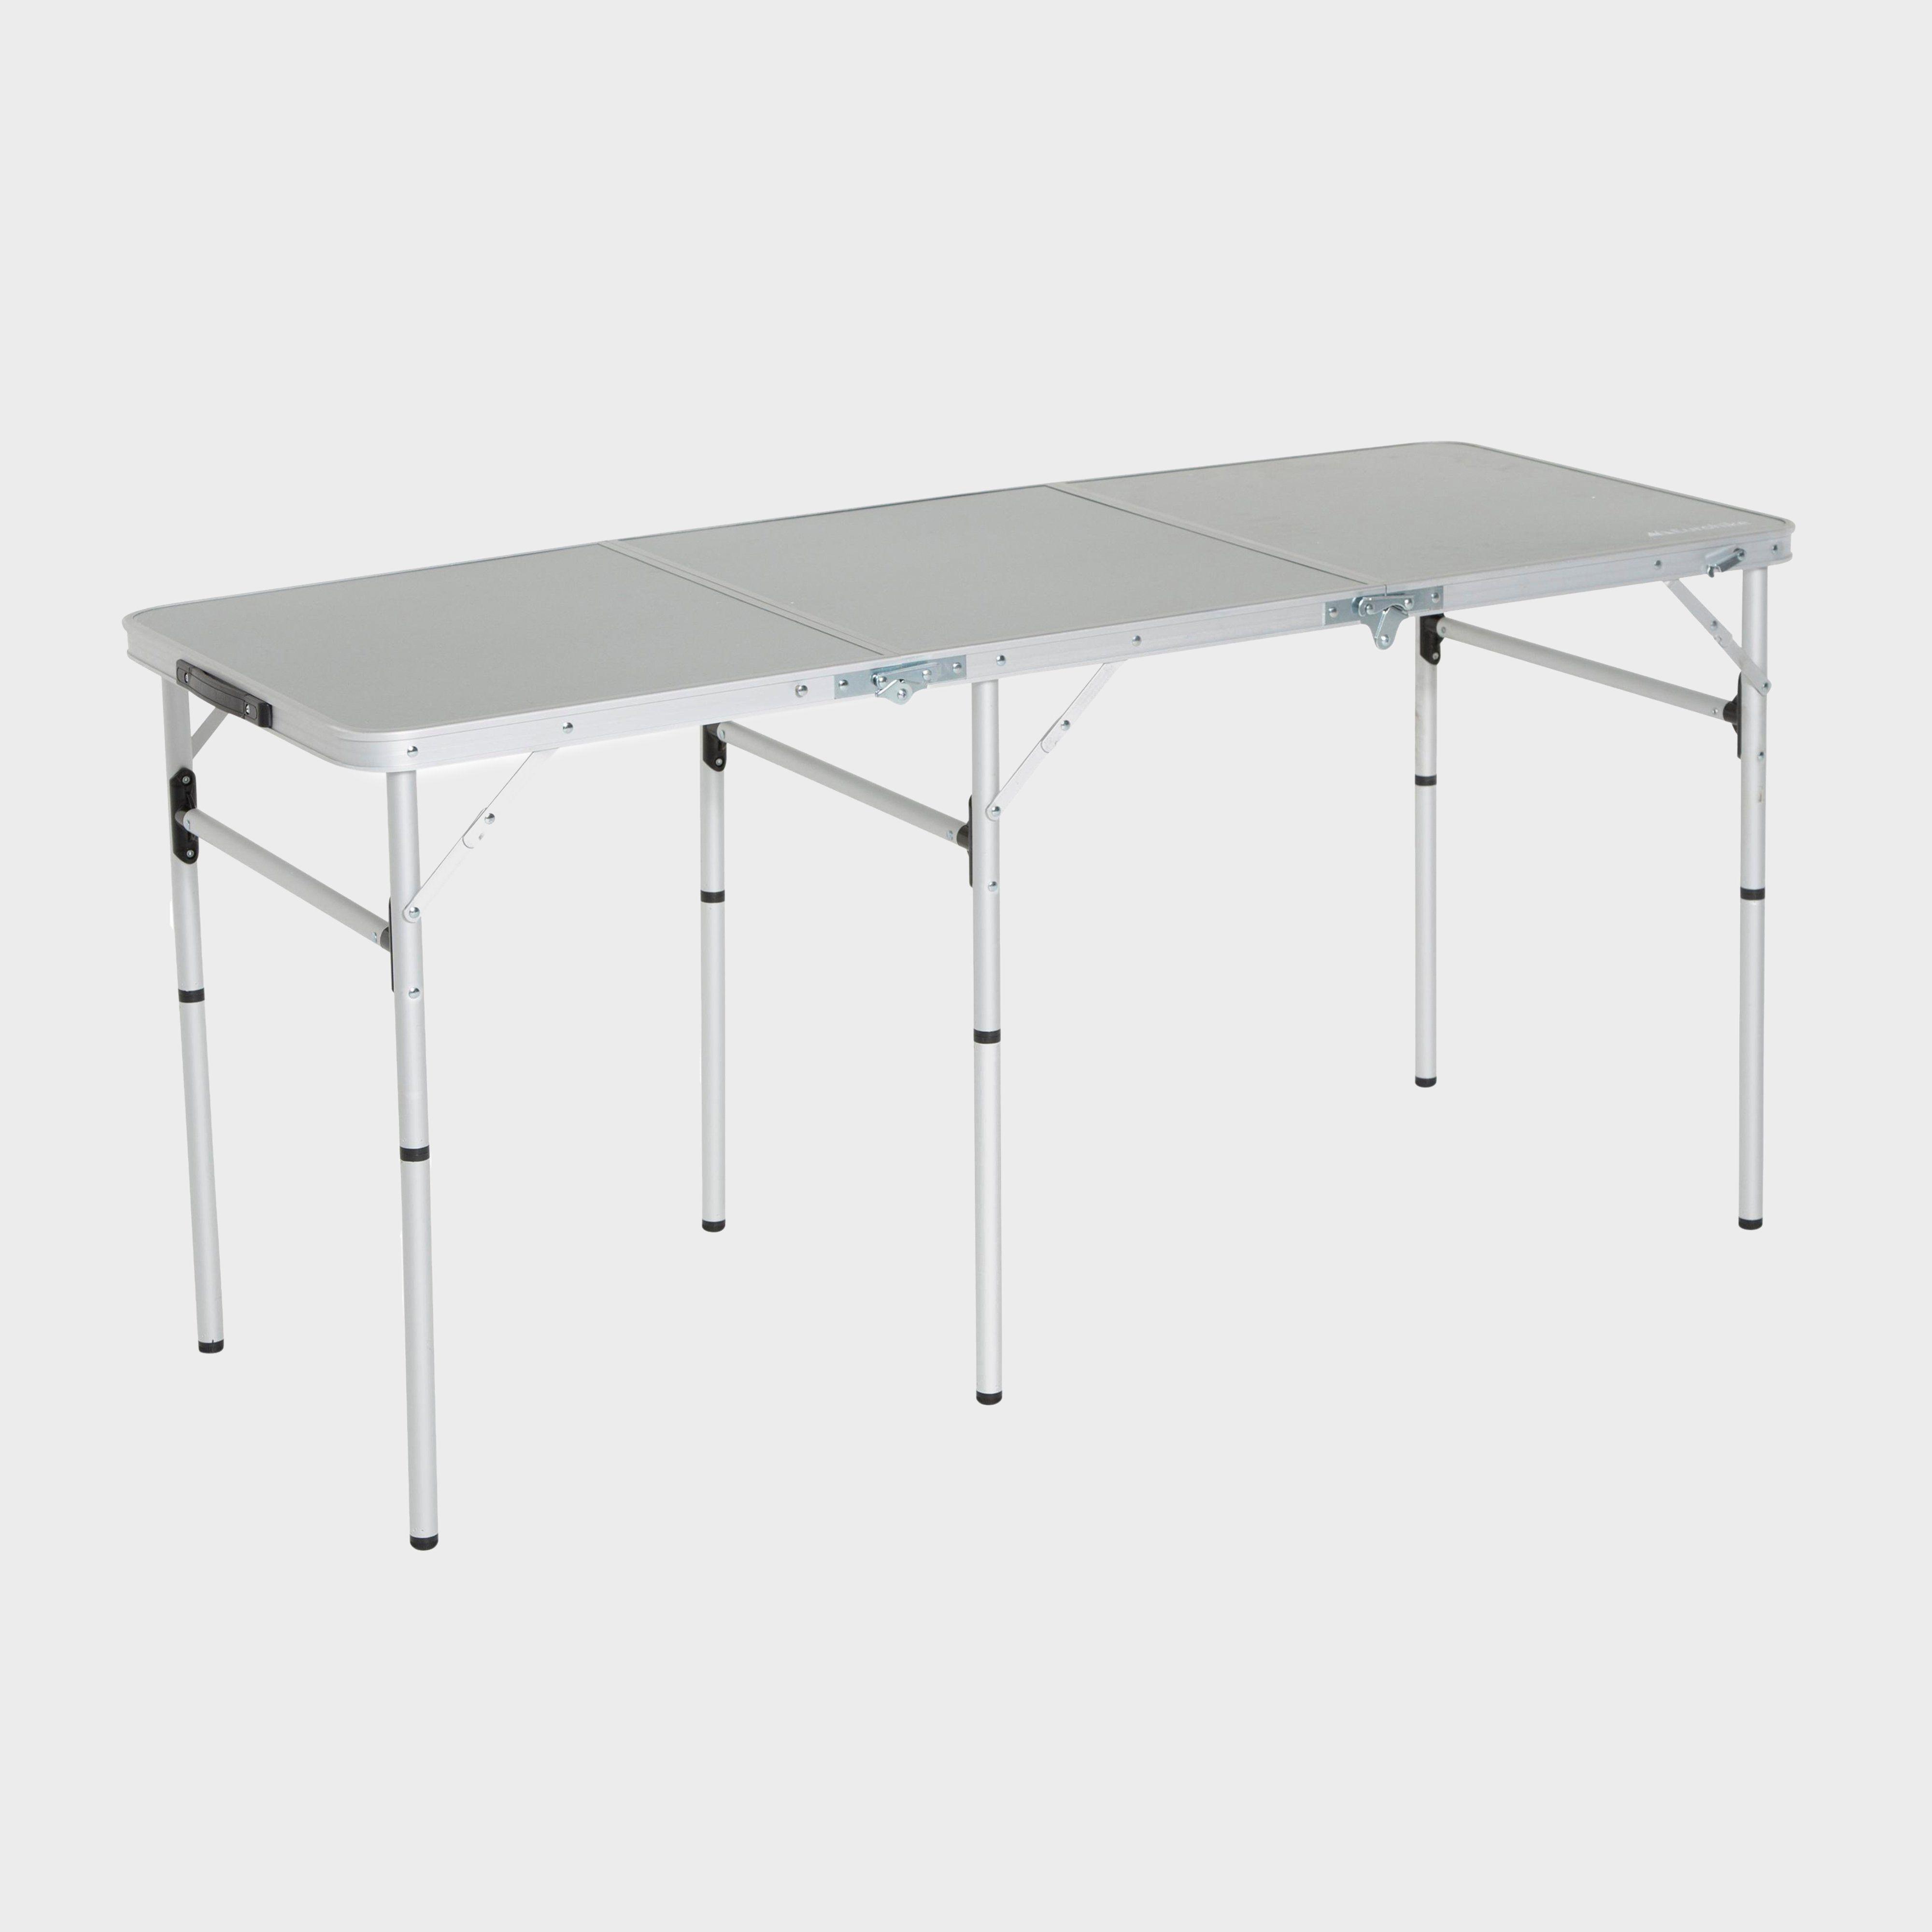 EUROHIKE Triple Table